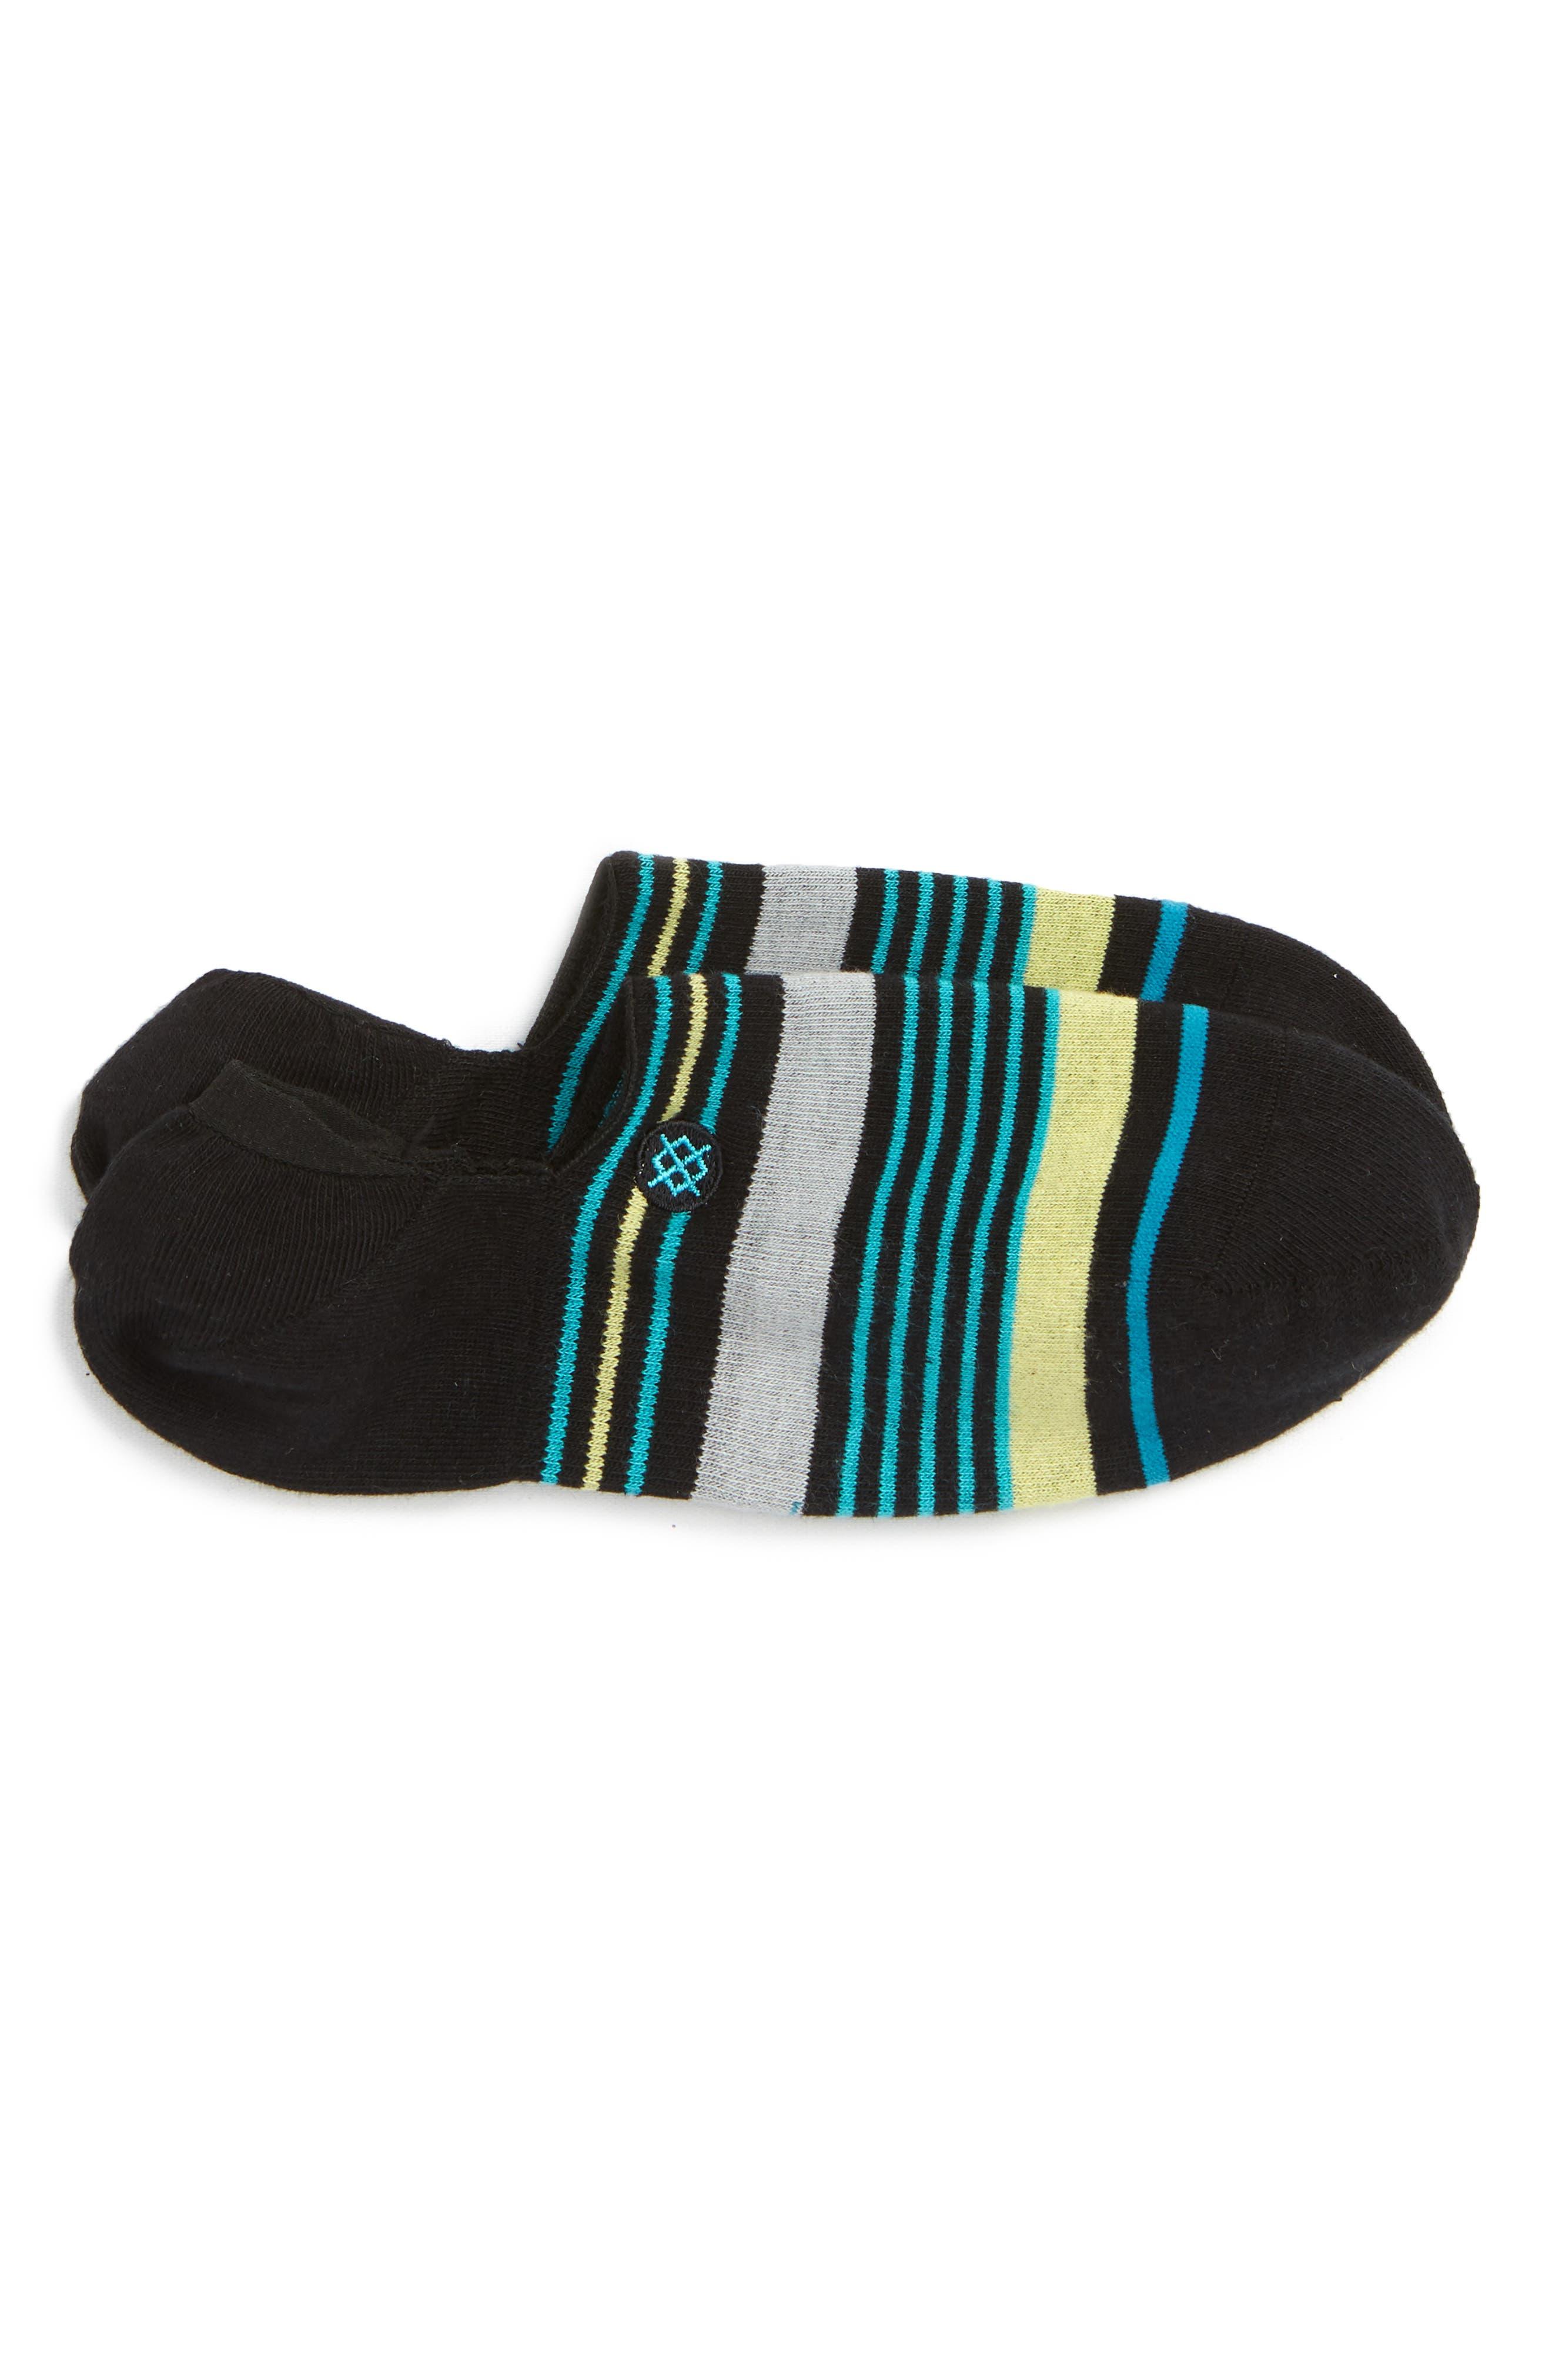 STANCE Reda Low Socks, Main, color, 001